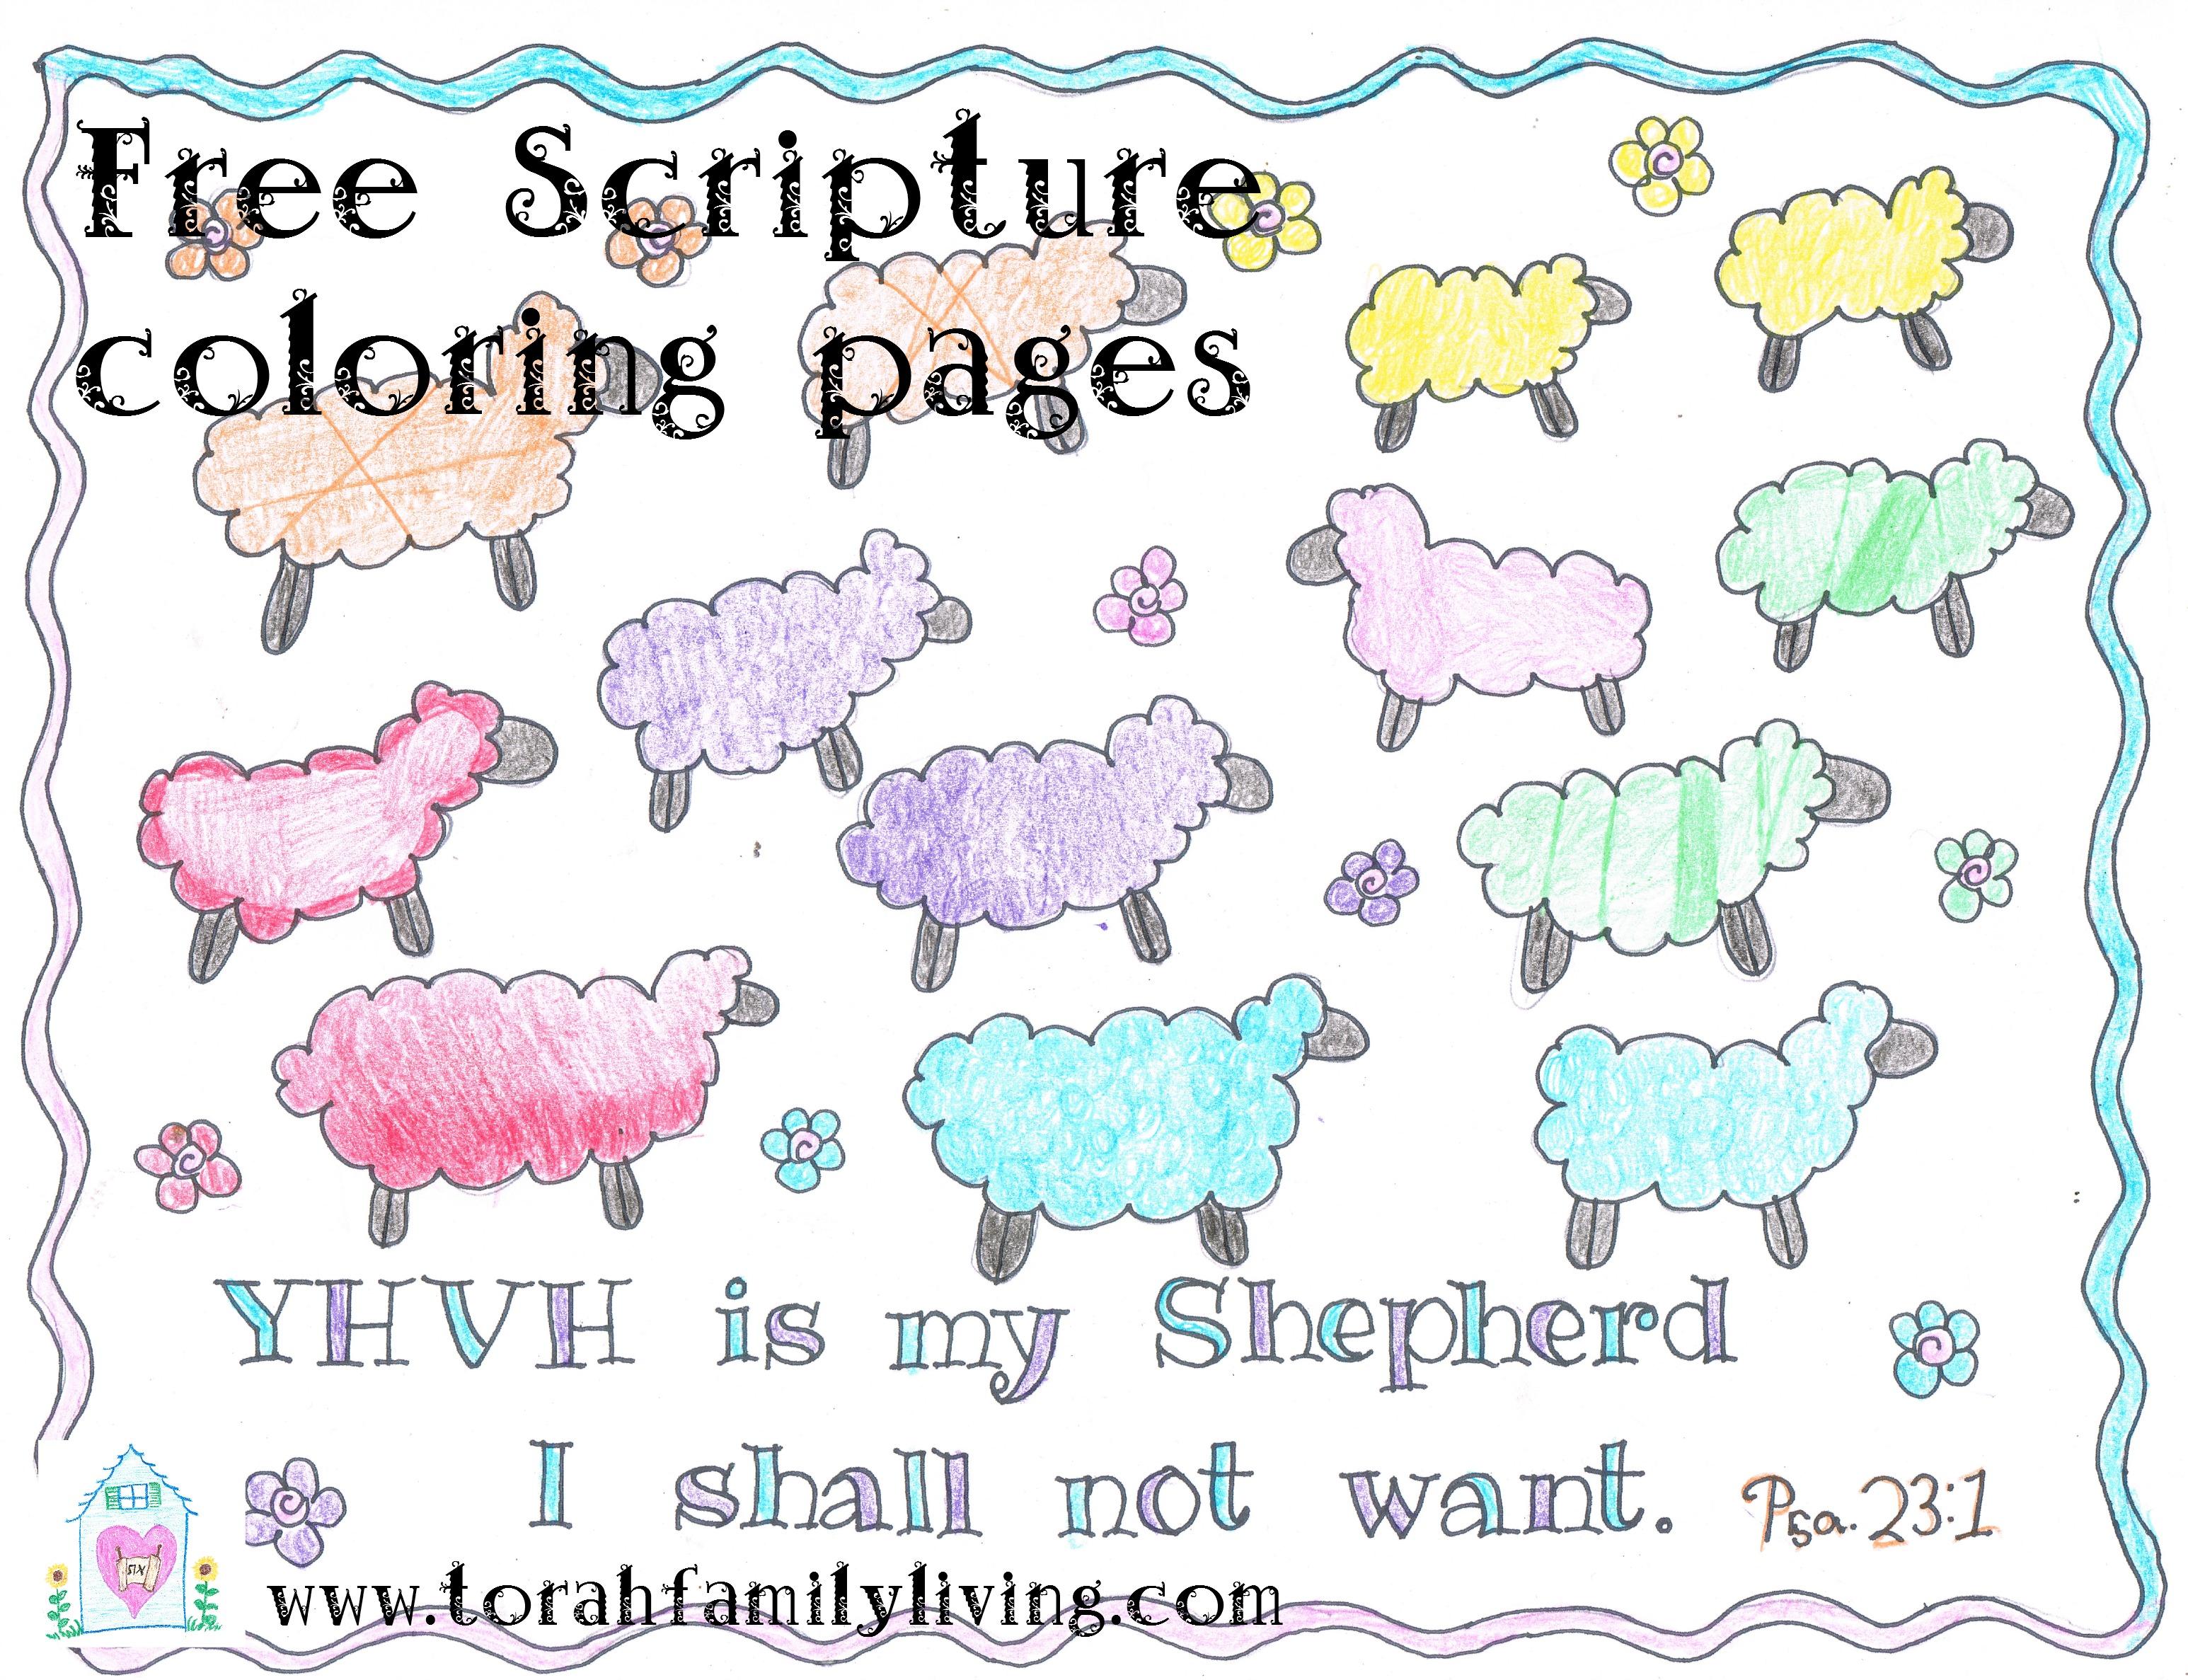 Scripture Coloring Pages